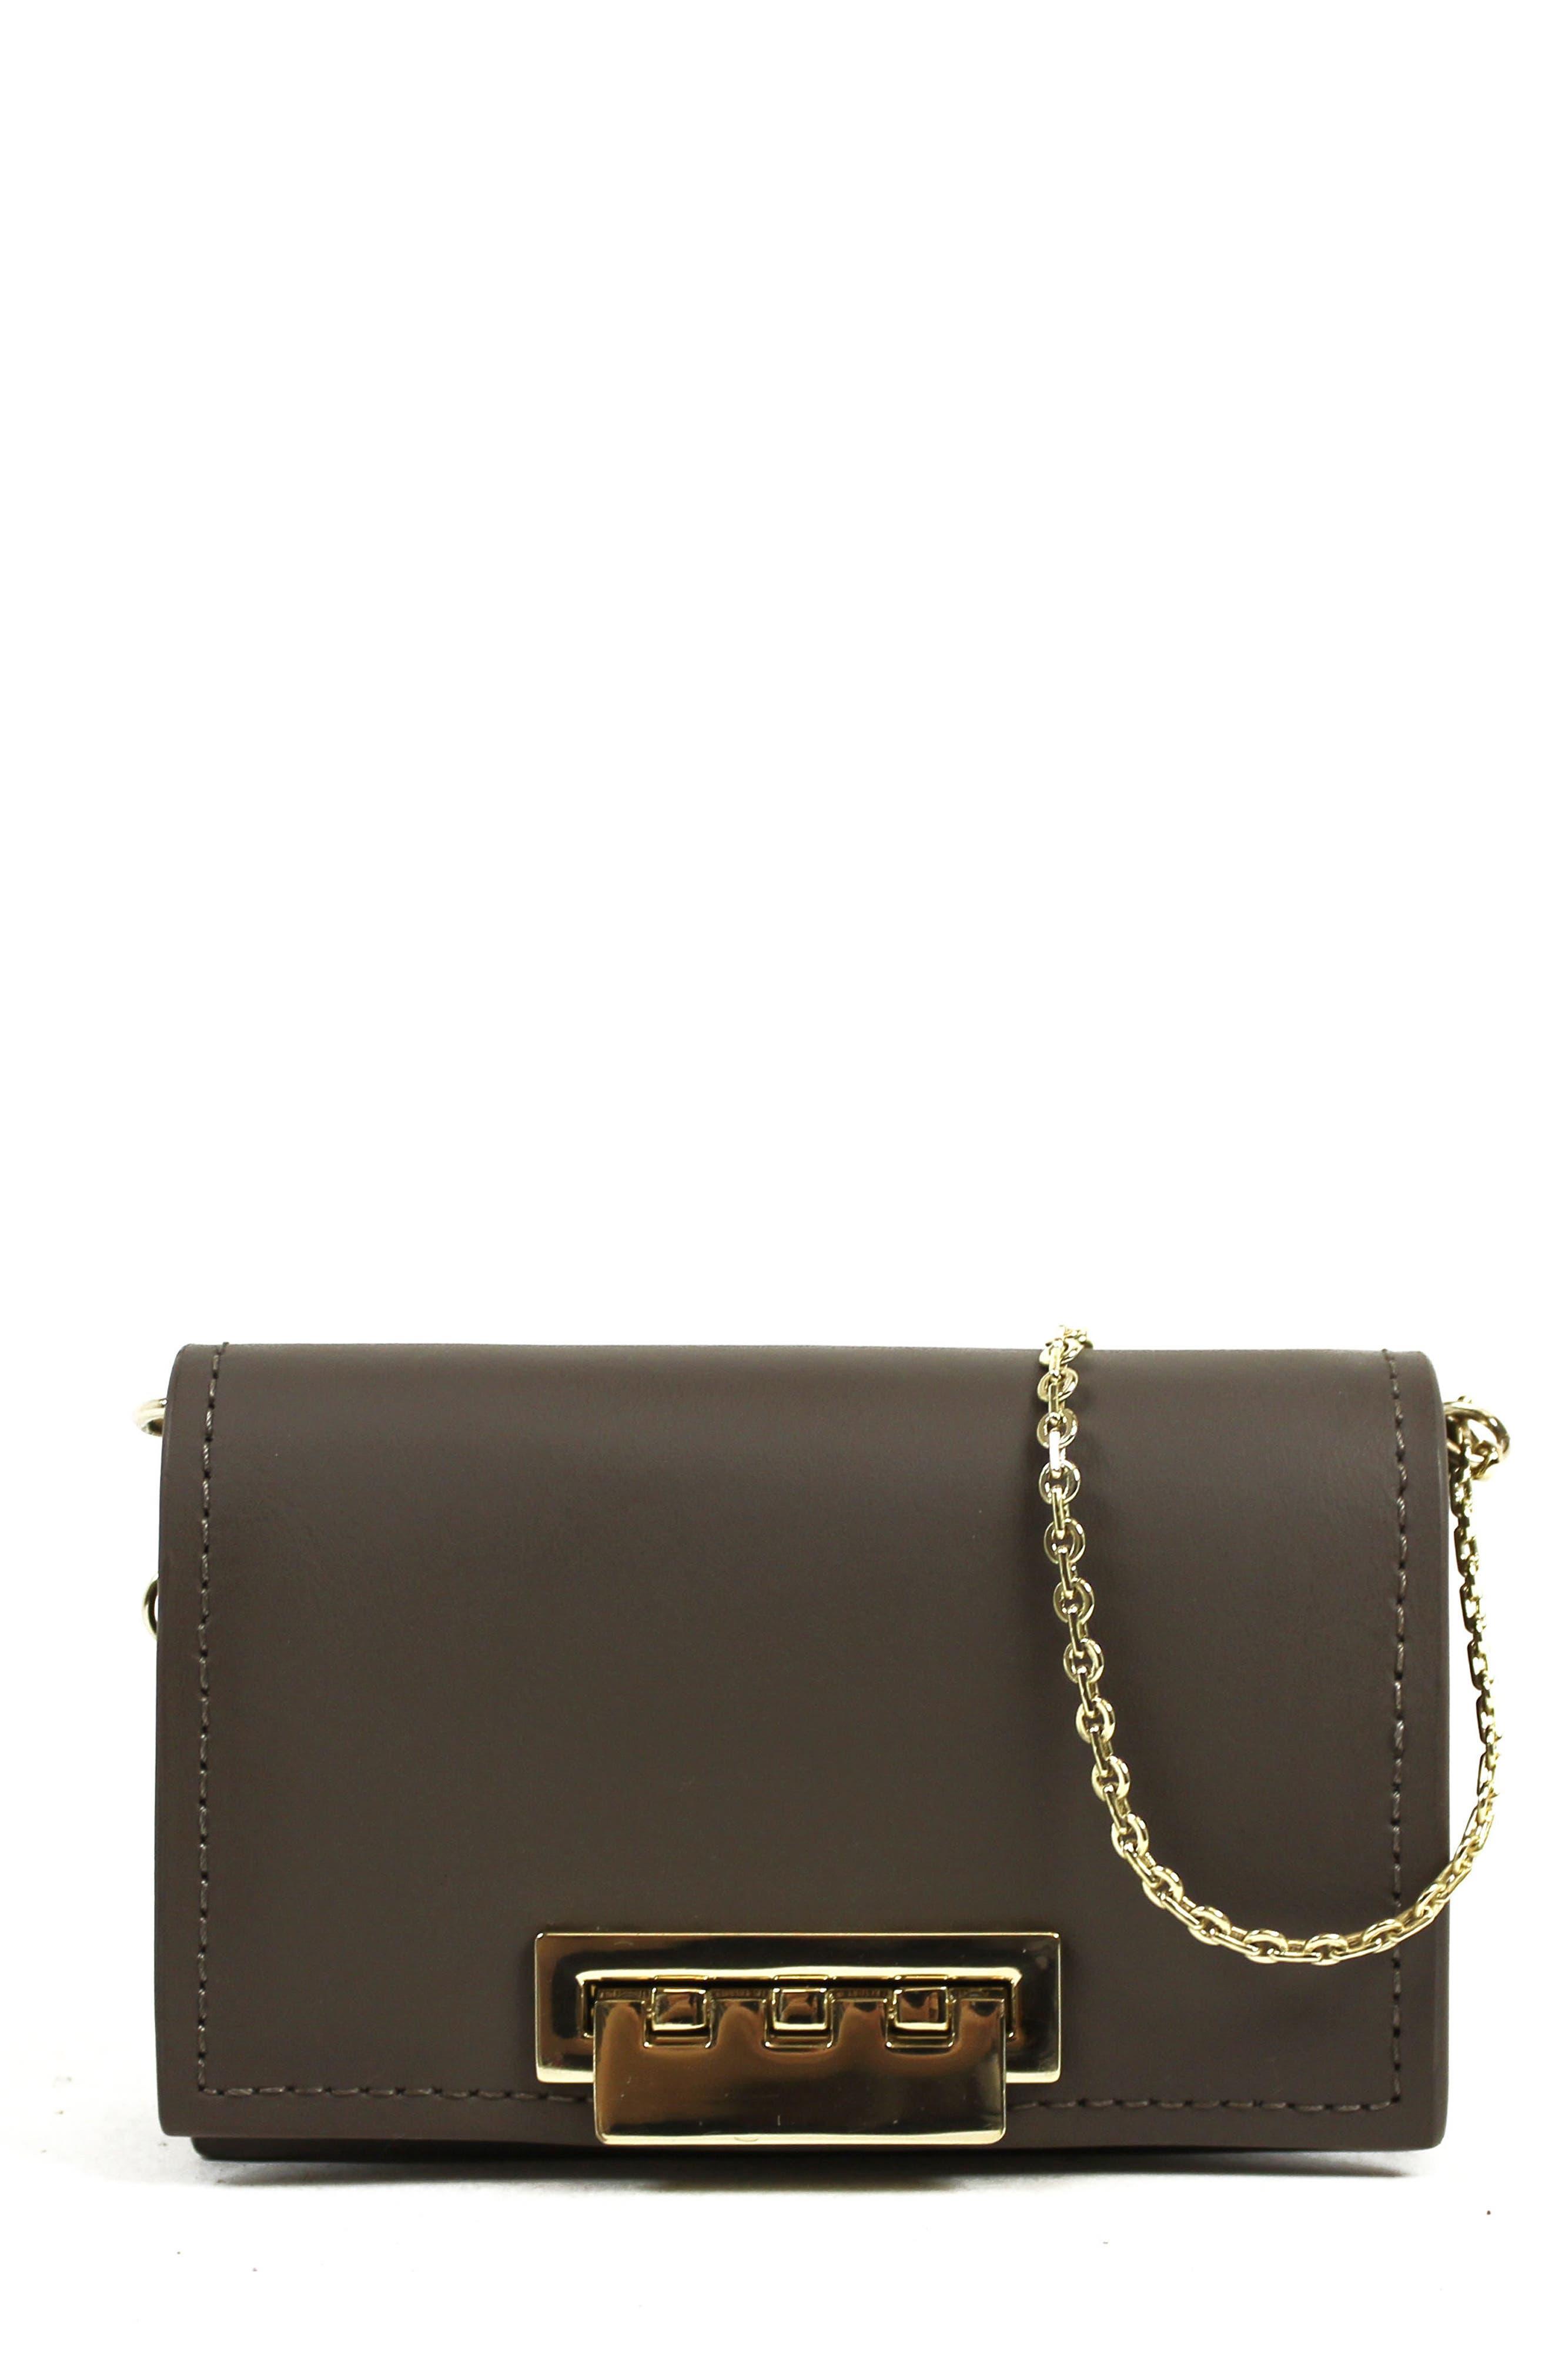 Main Image - ZAC Zac Posen Earthette Leather Card Case